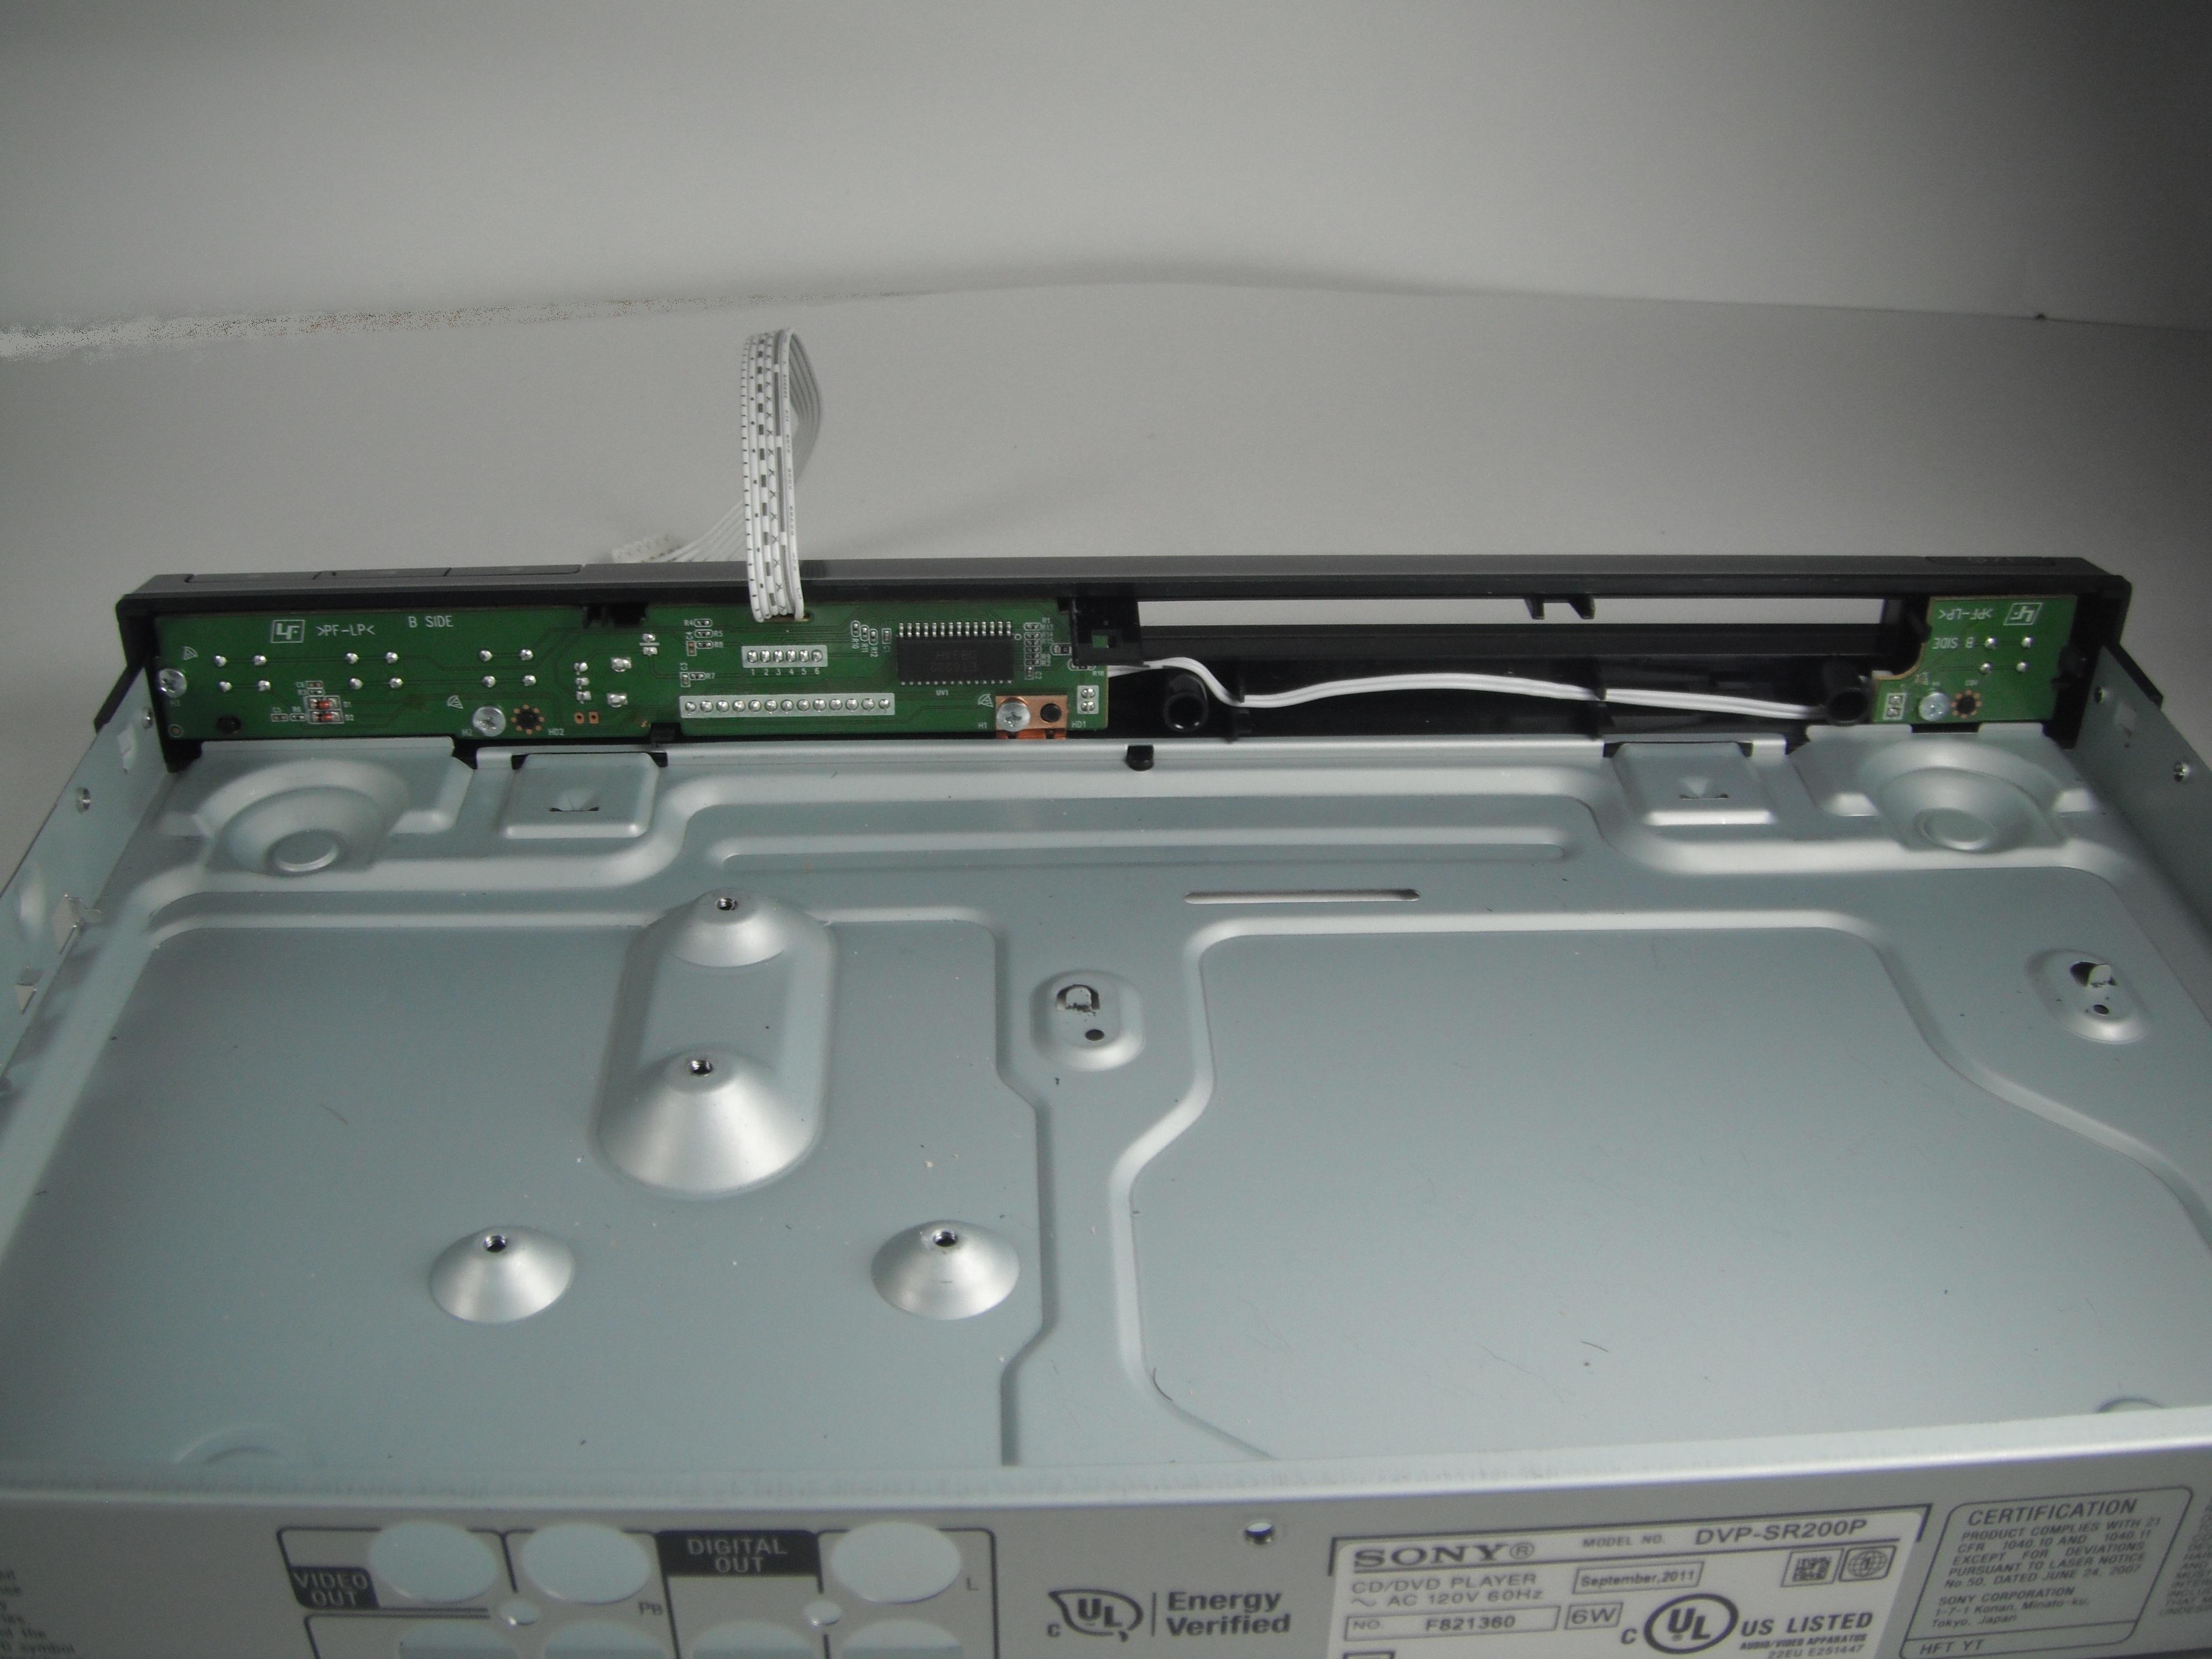 sony dvp sr200p repair ifixit rh ifixit com Sony DVP Ns57p DVD Player Sony DVP Ns57p DVD